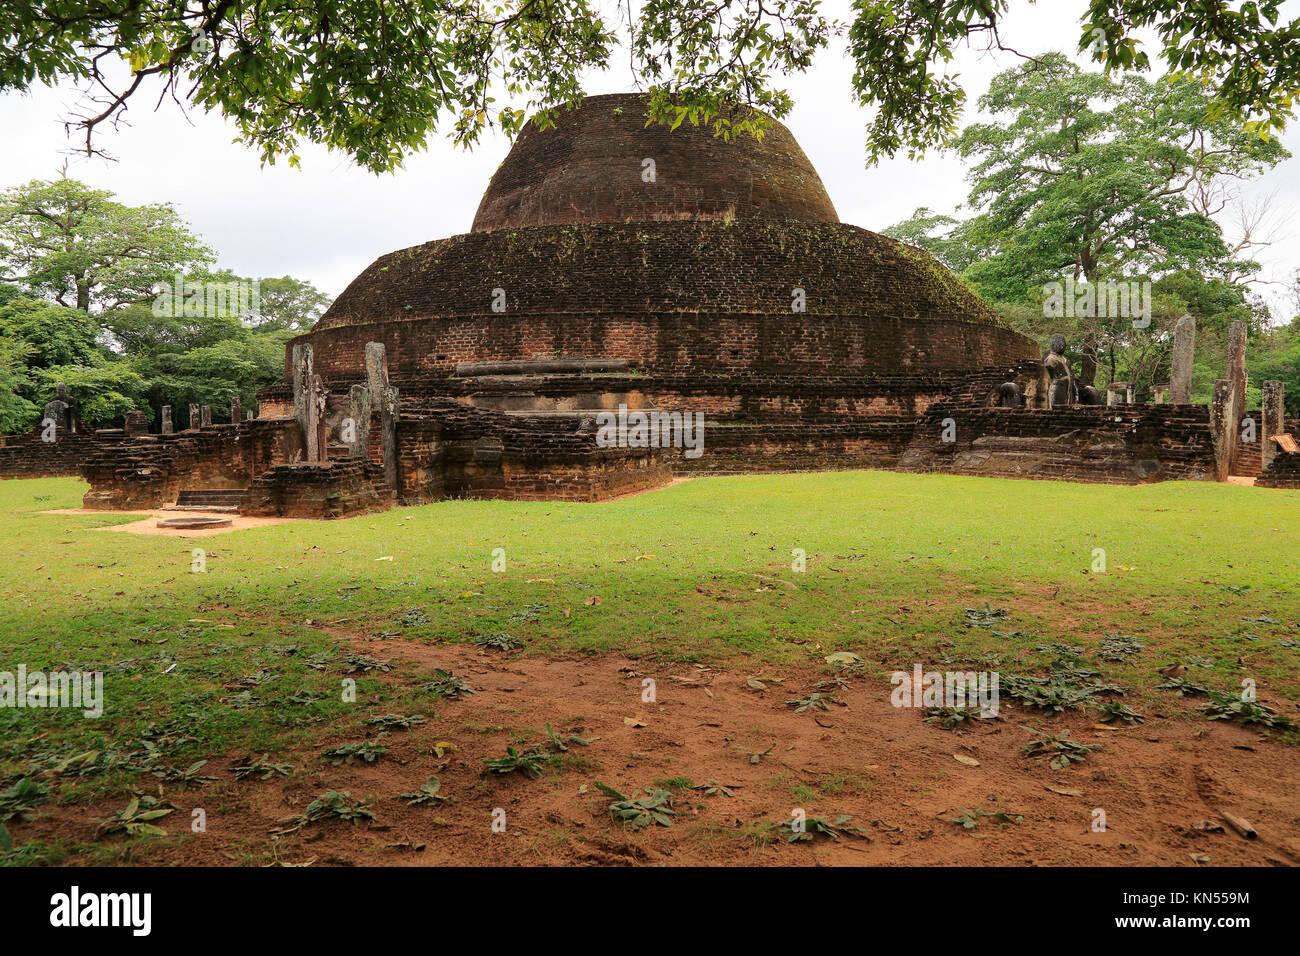 Pabula Vihara temple, UNESCO World Heritage Site, the ancient city of Polonnaruwa, Sri Lanka, Asia - Stock Image